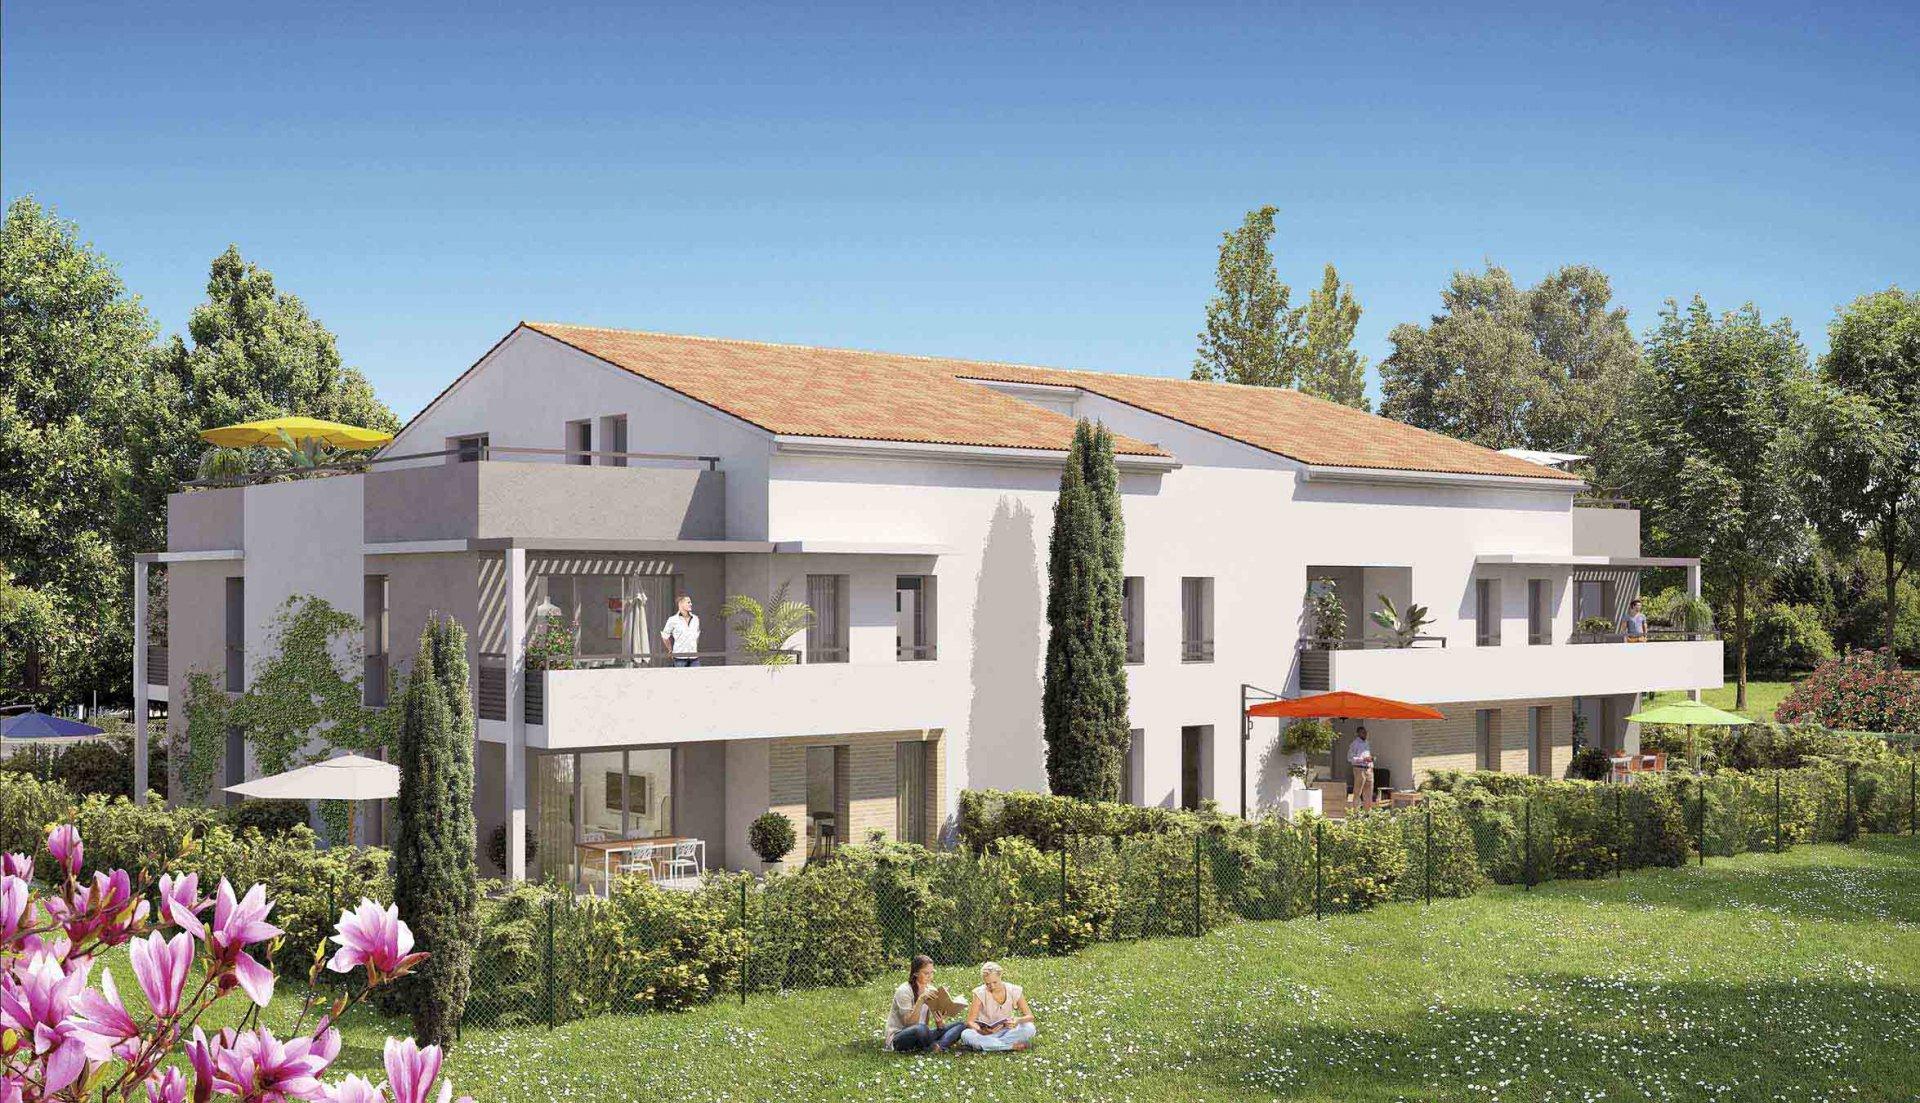 Programme Immeuble - Saint-Orens-de-Gameville